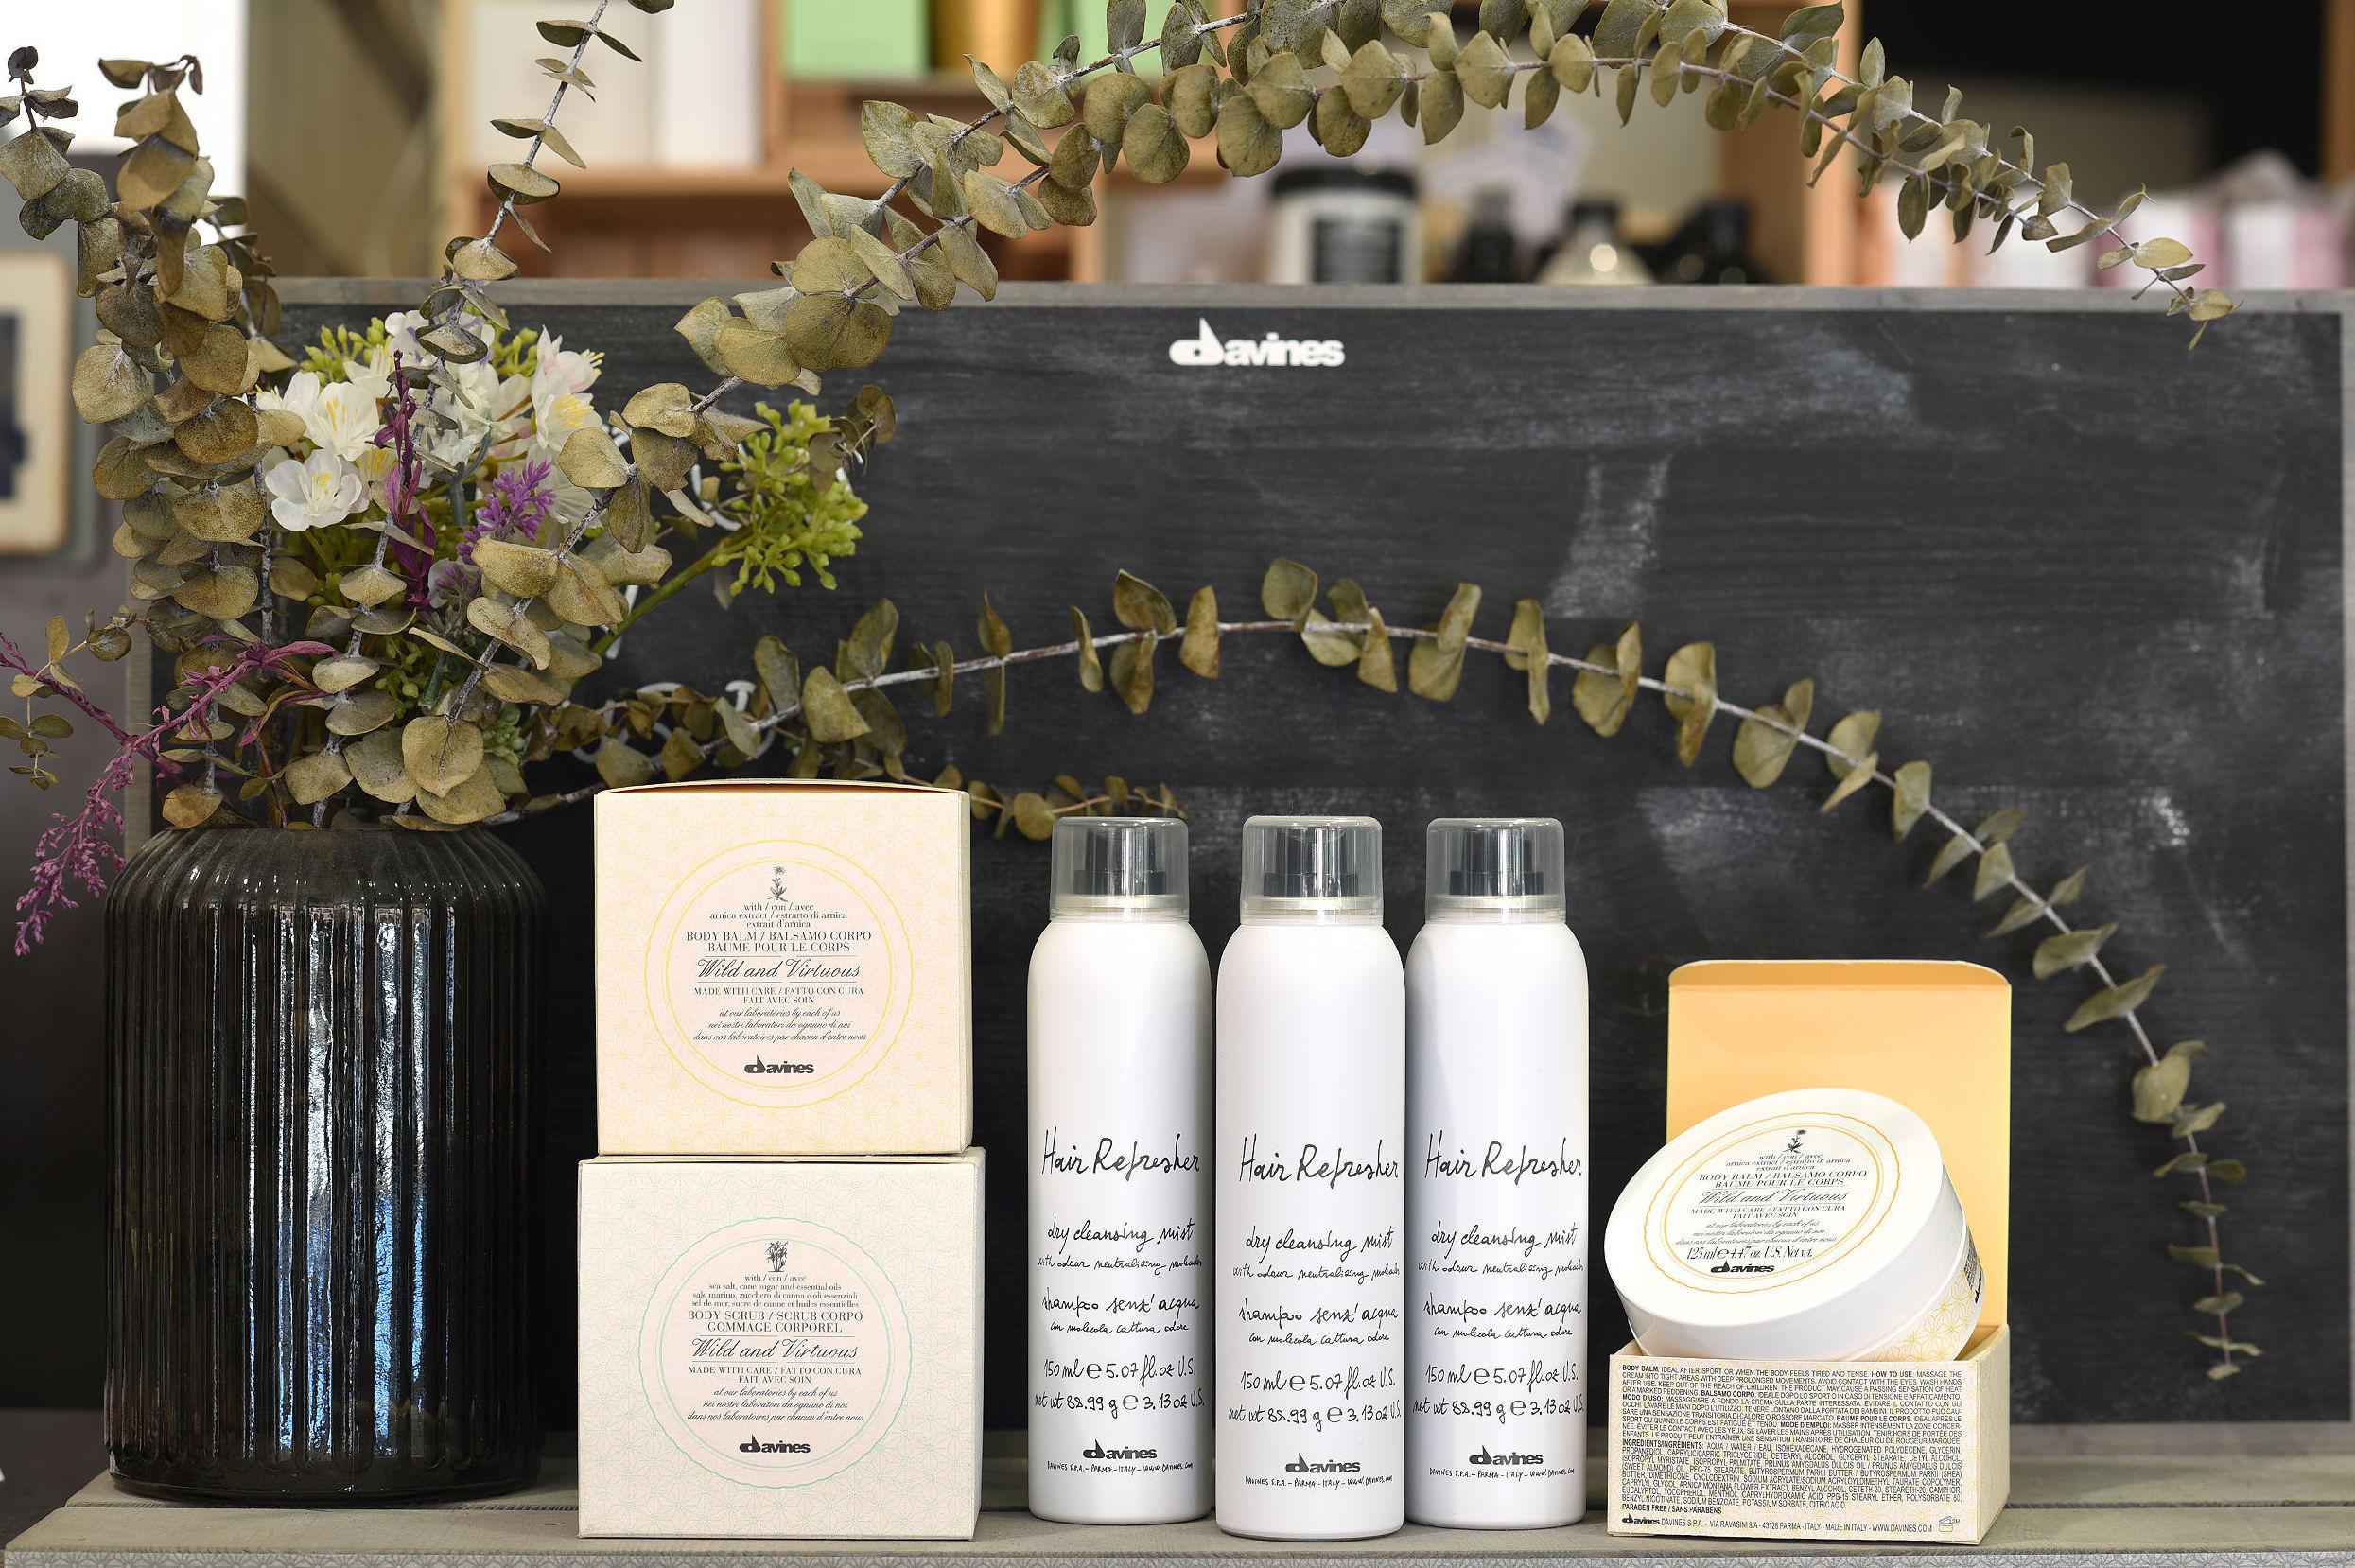 Hair Refresher: Alta Cosmética Natural de Sostenible Beauty Concepts